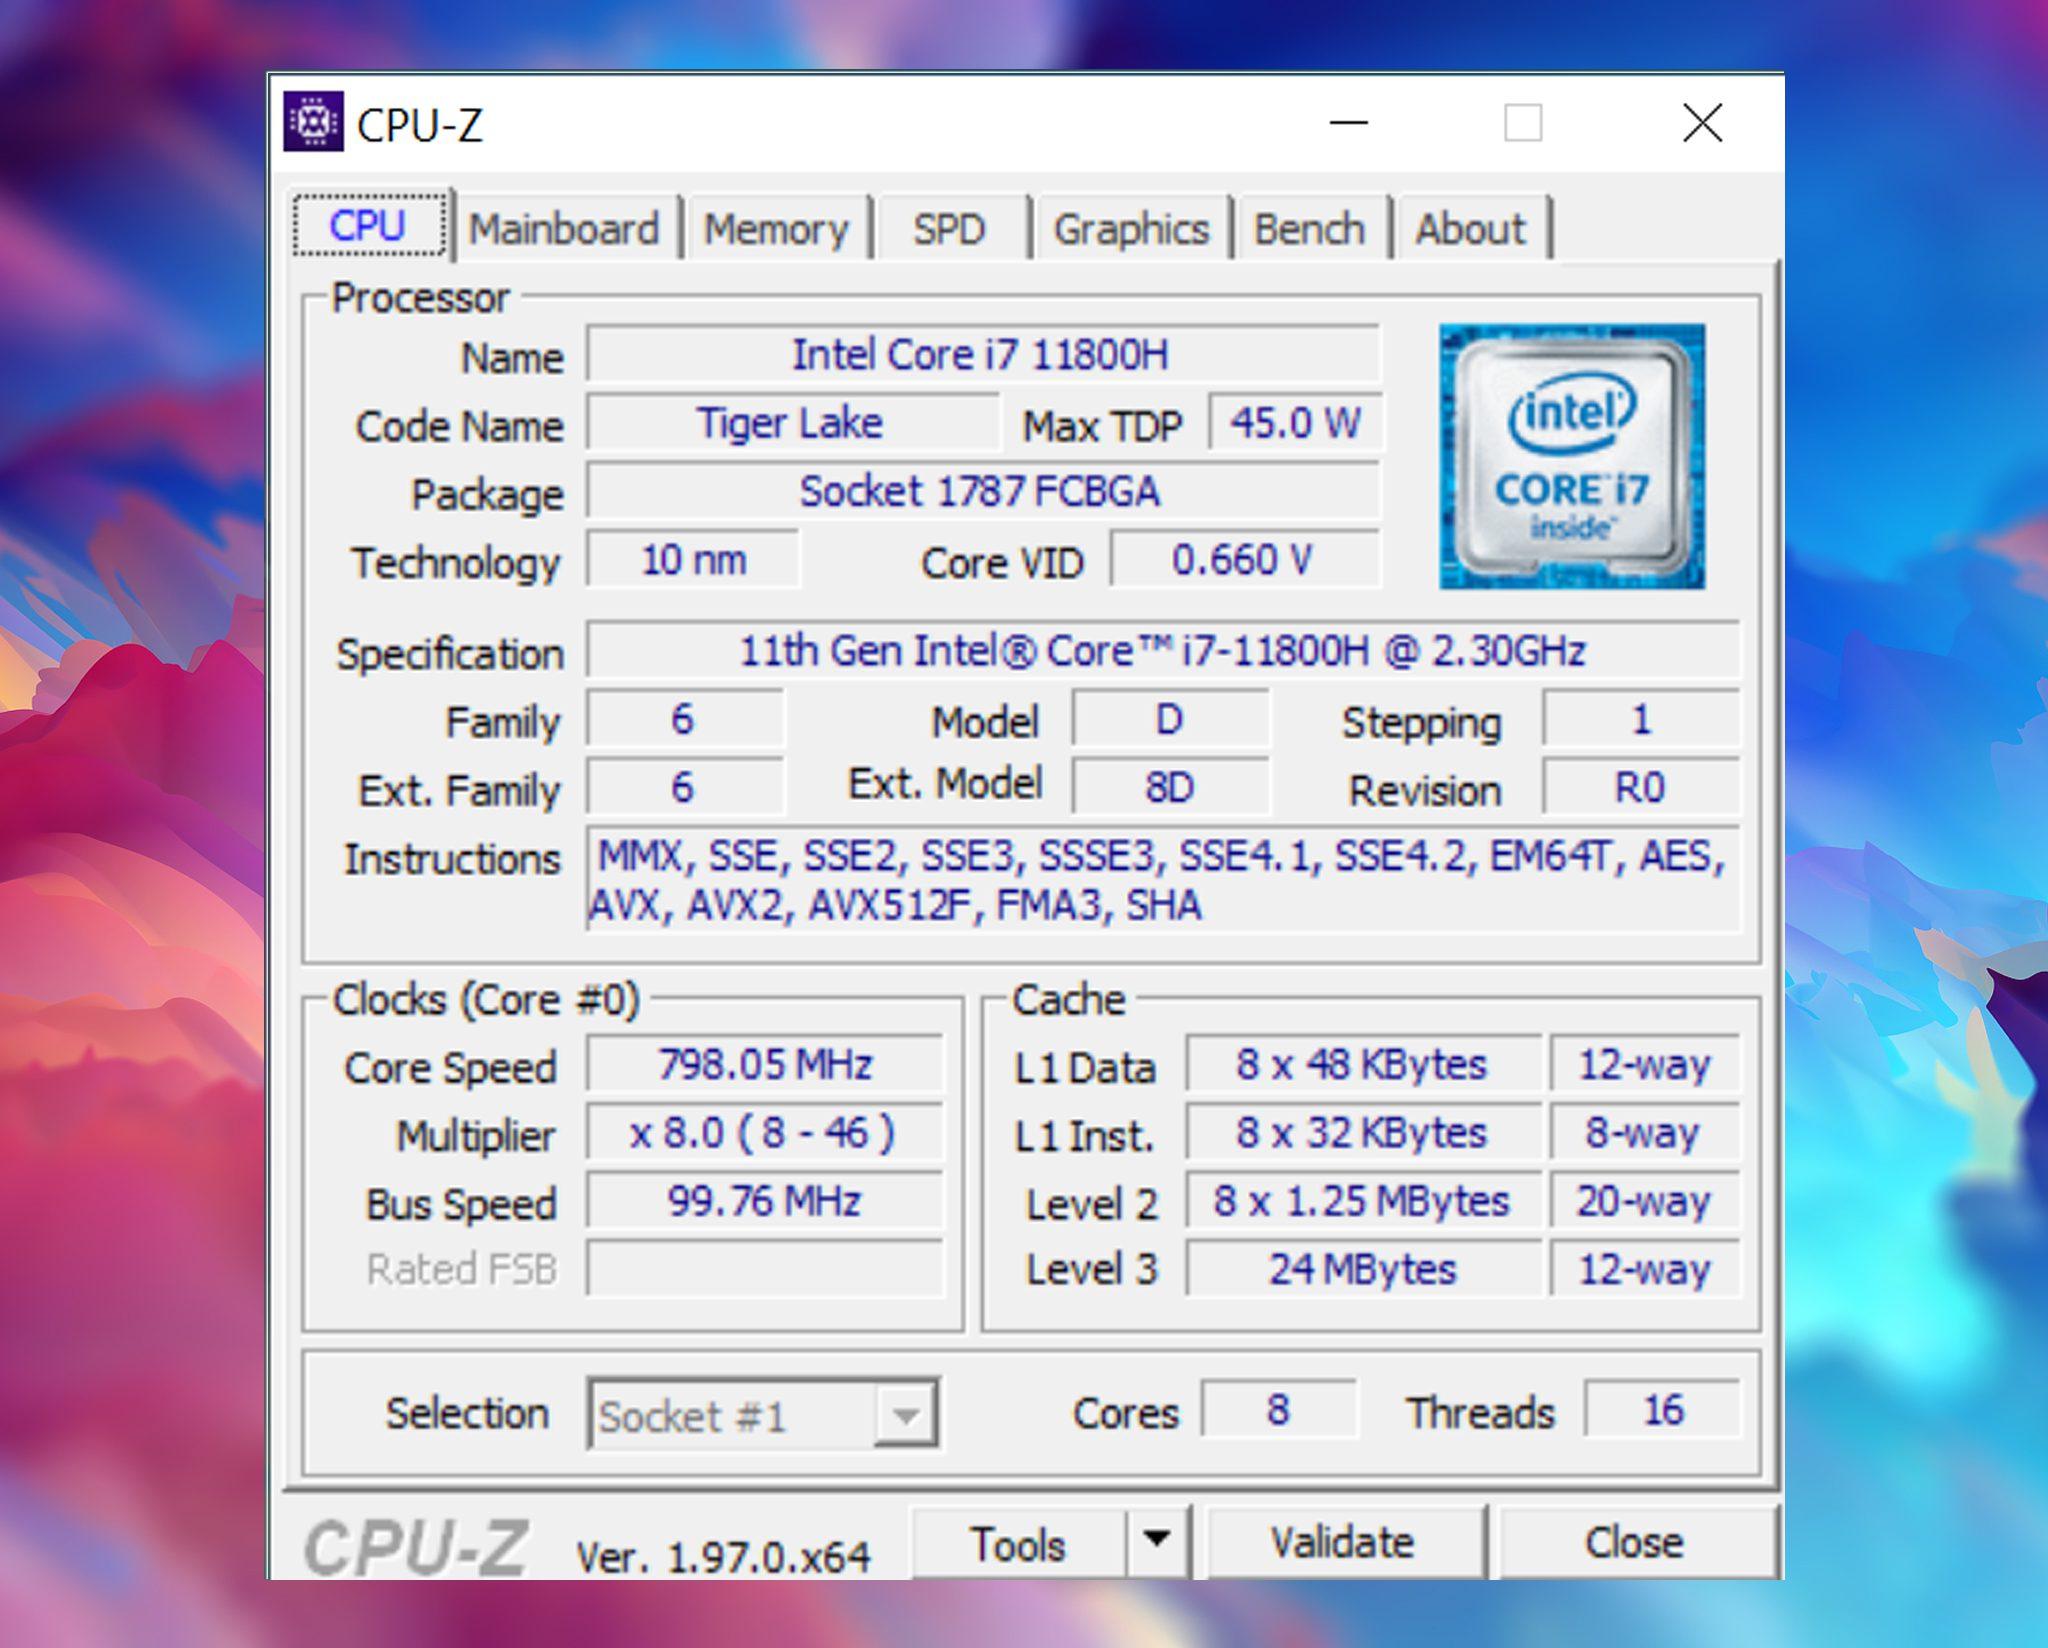 Cpu-z RAM msi creator